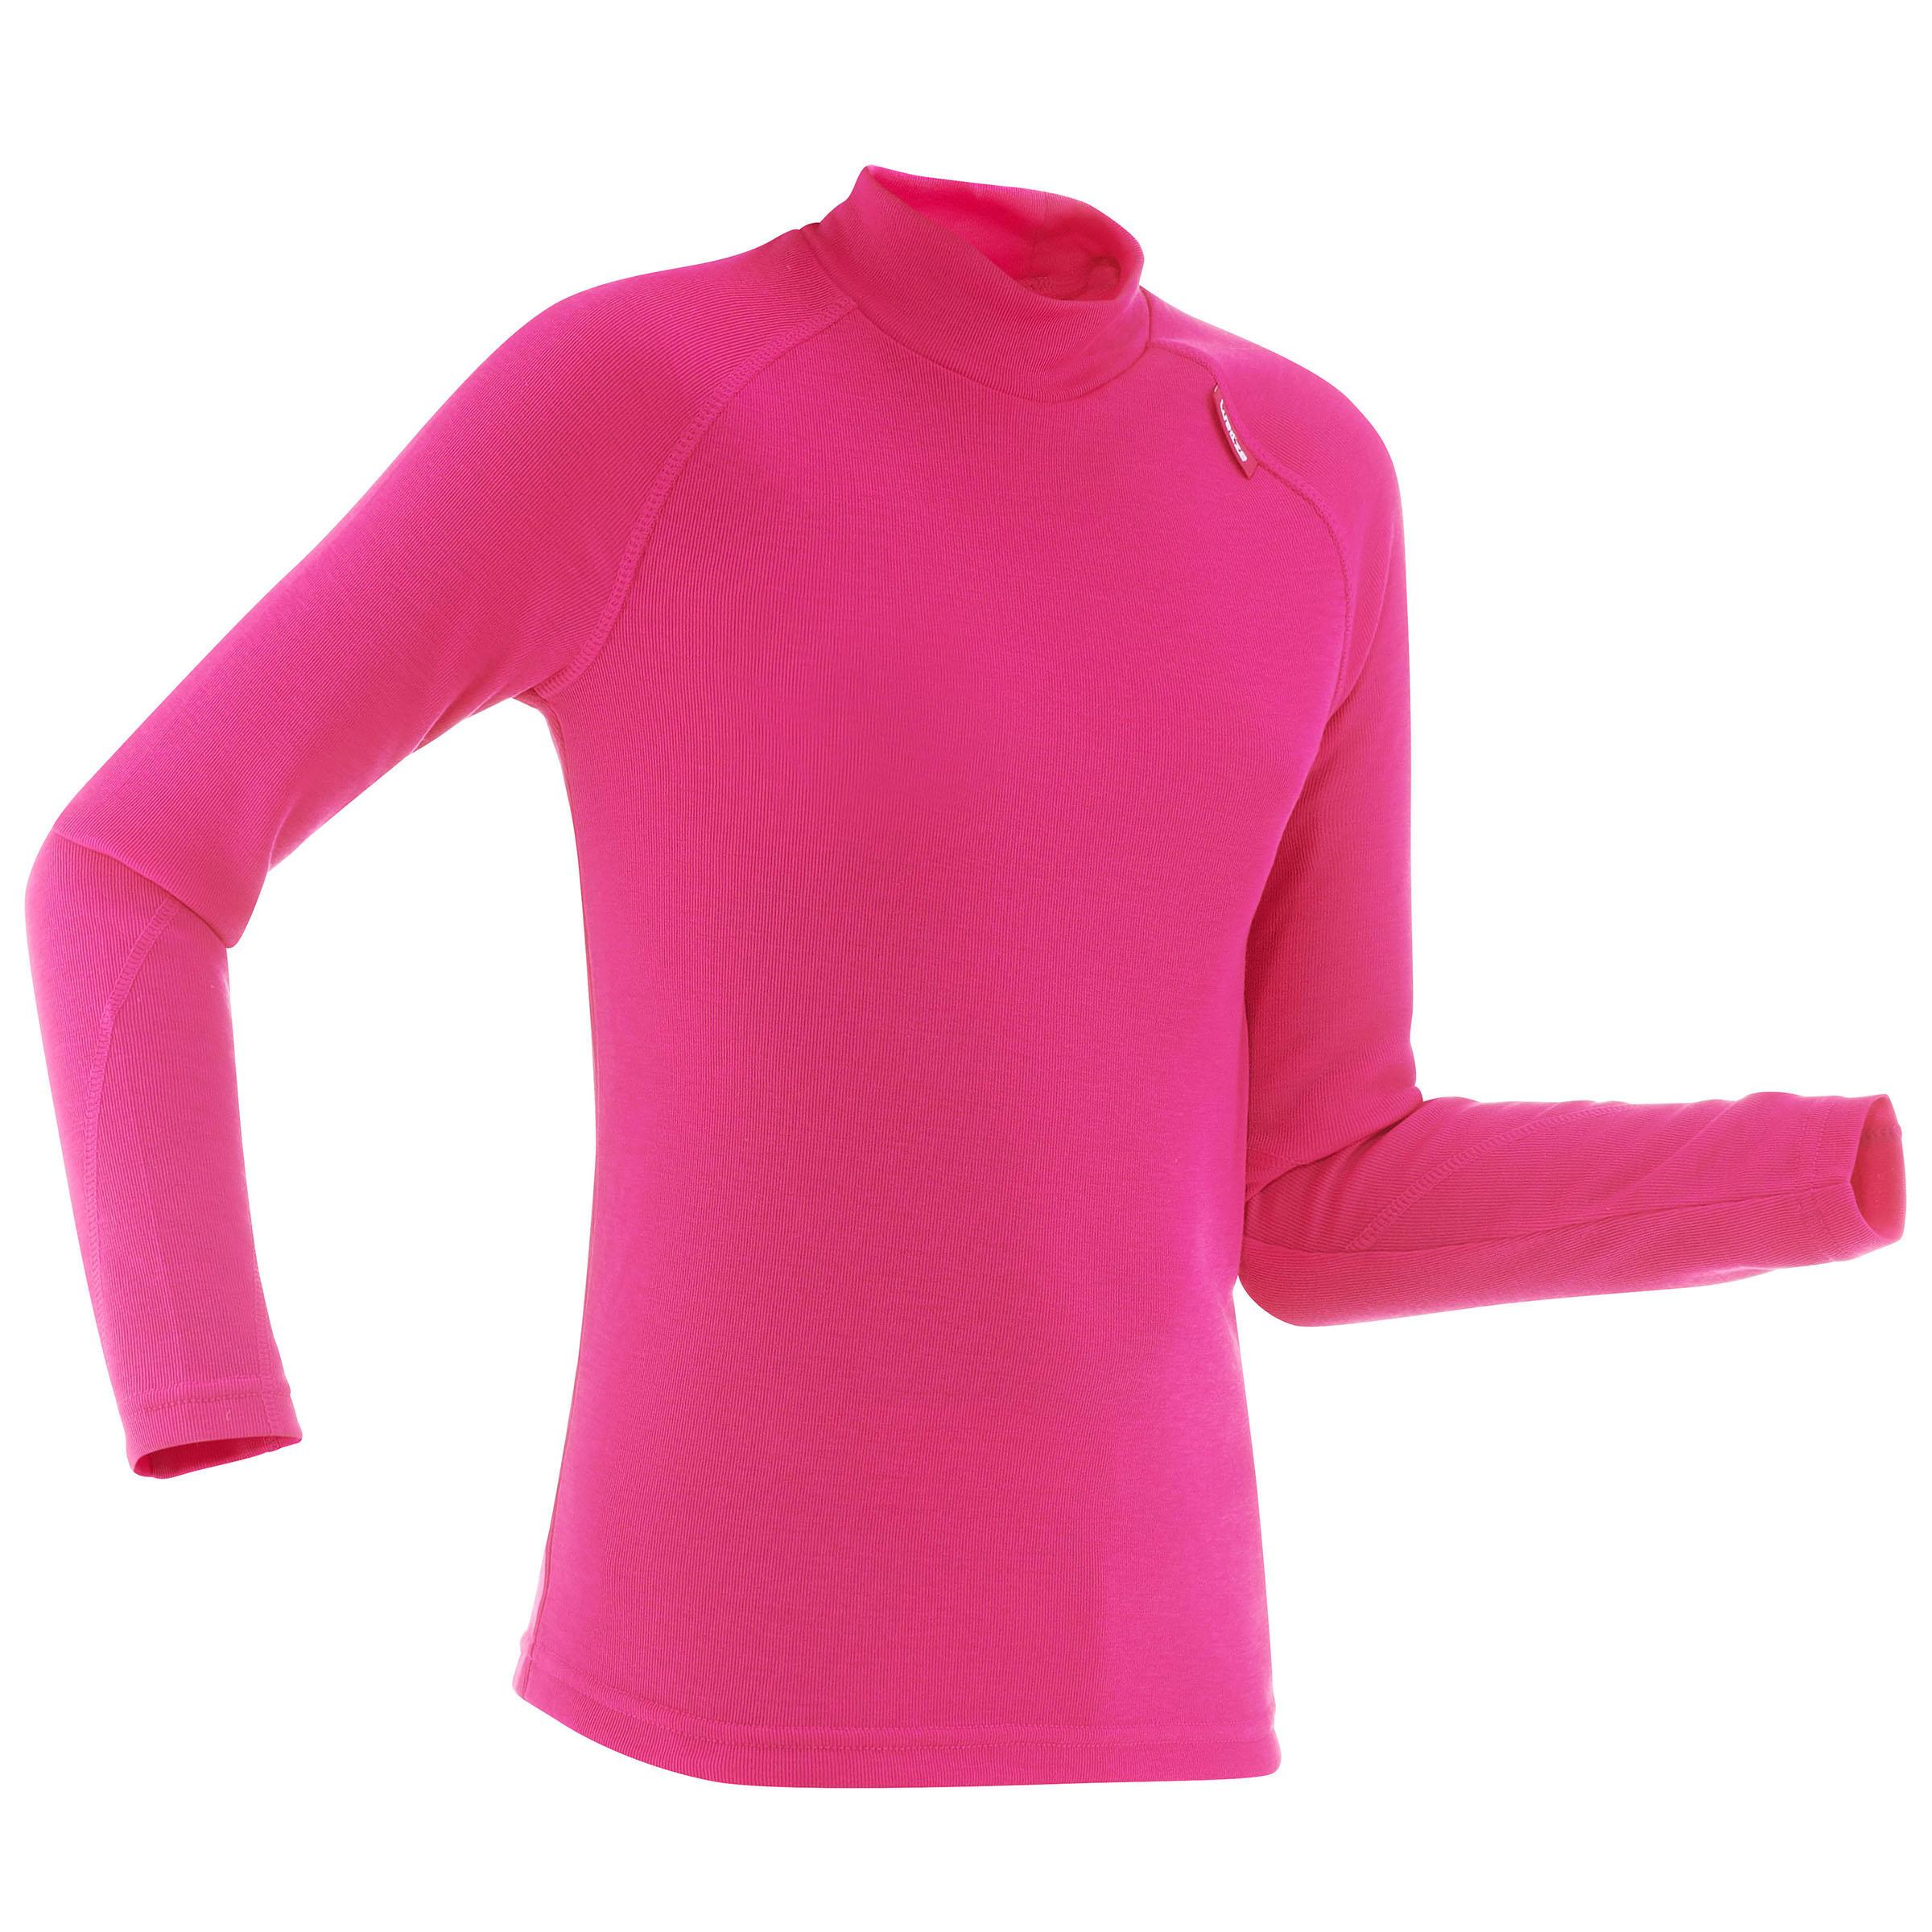 Camiseta de esquí niño 100 rosa